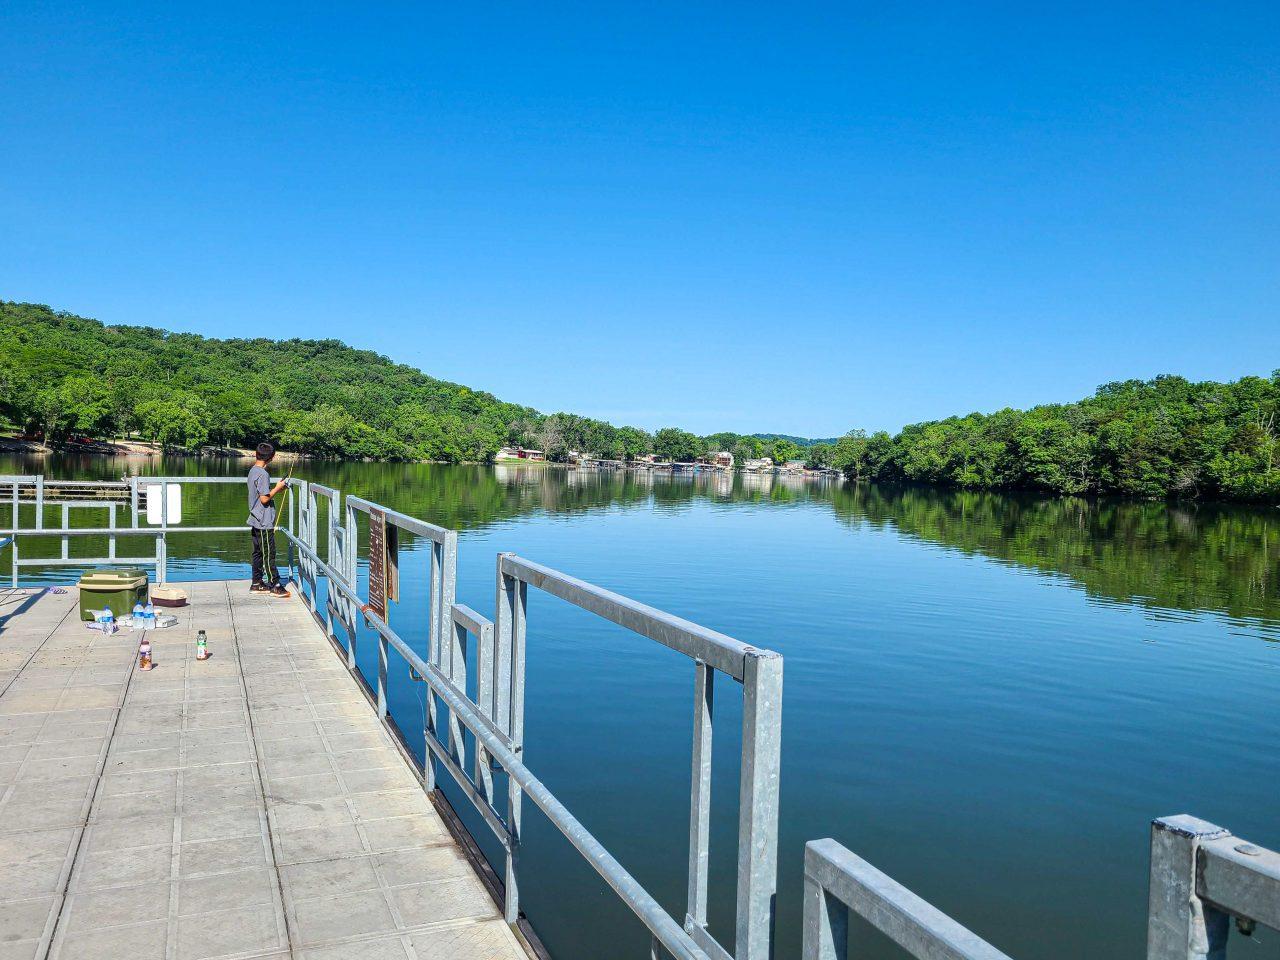 Ha Ha Tonka State Park Missouri- - public boat dock